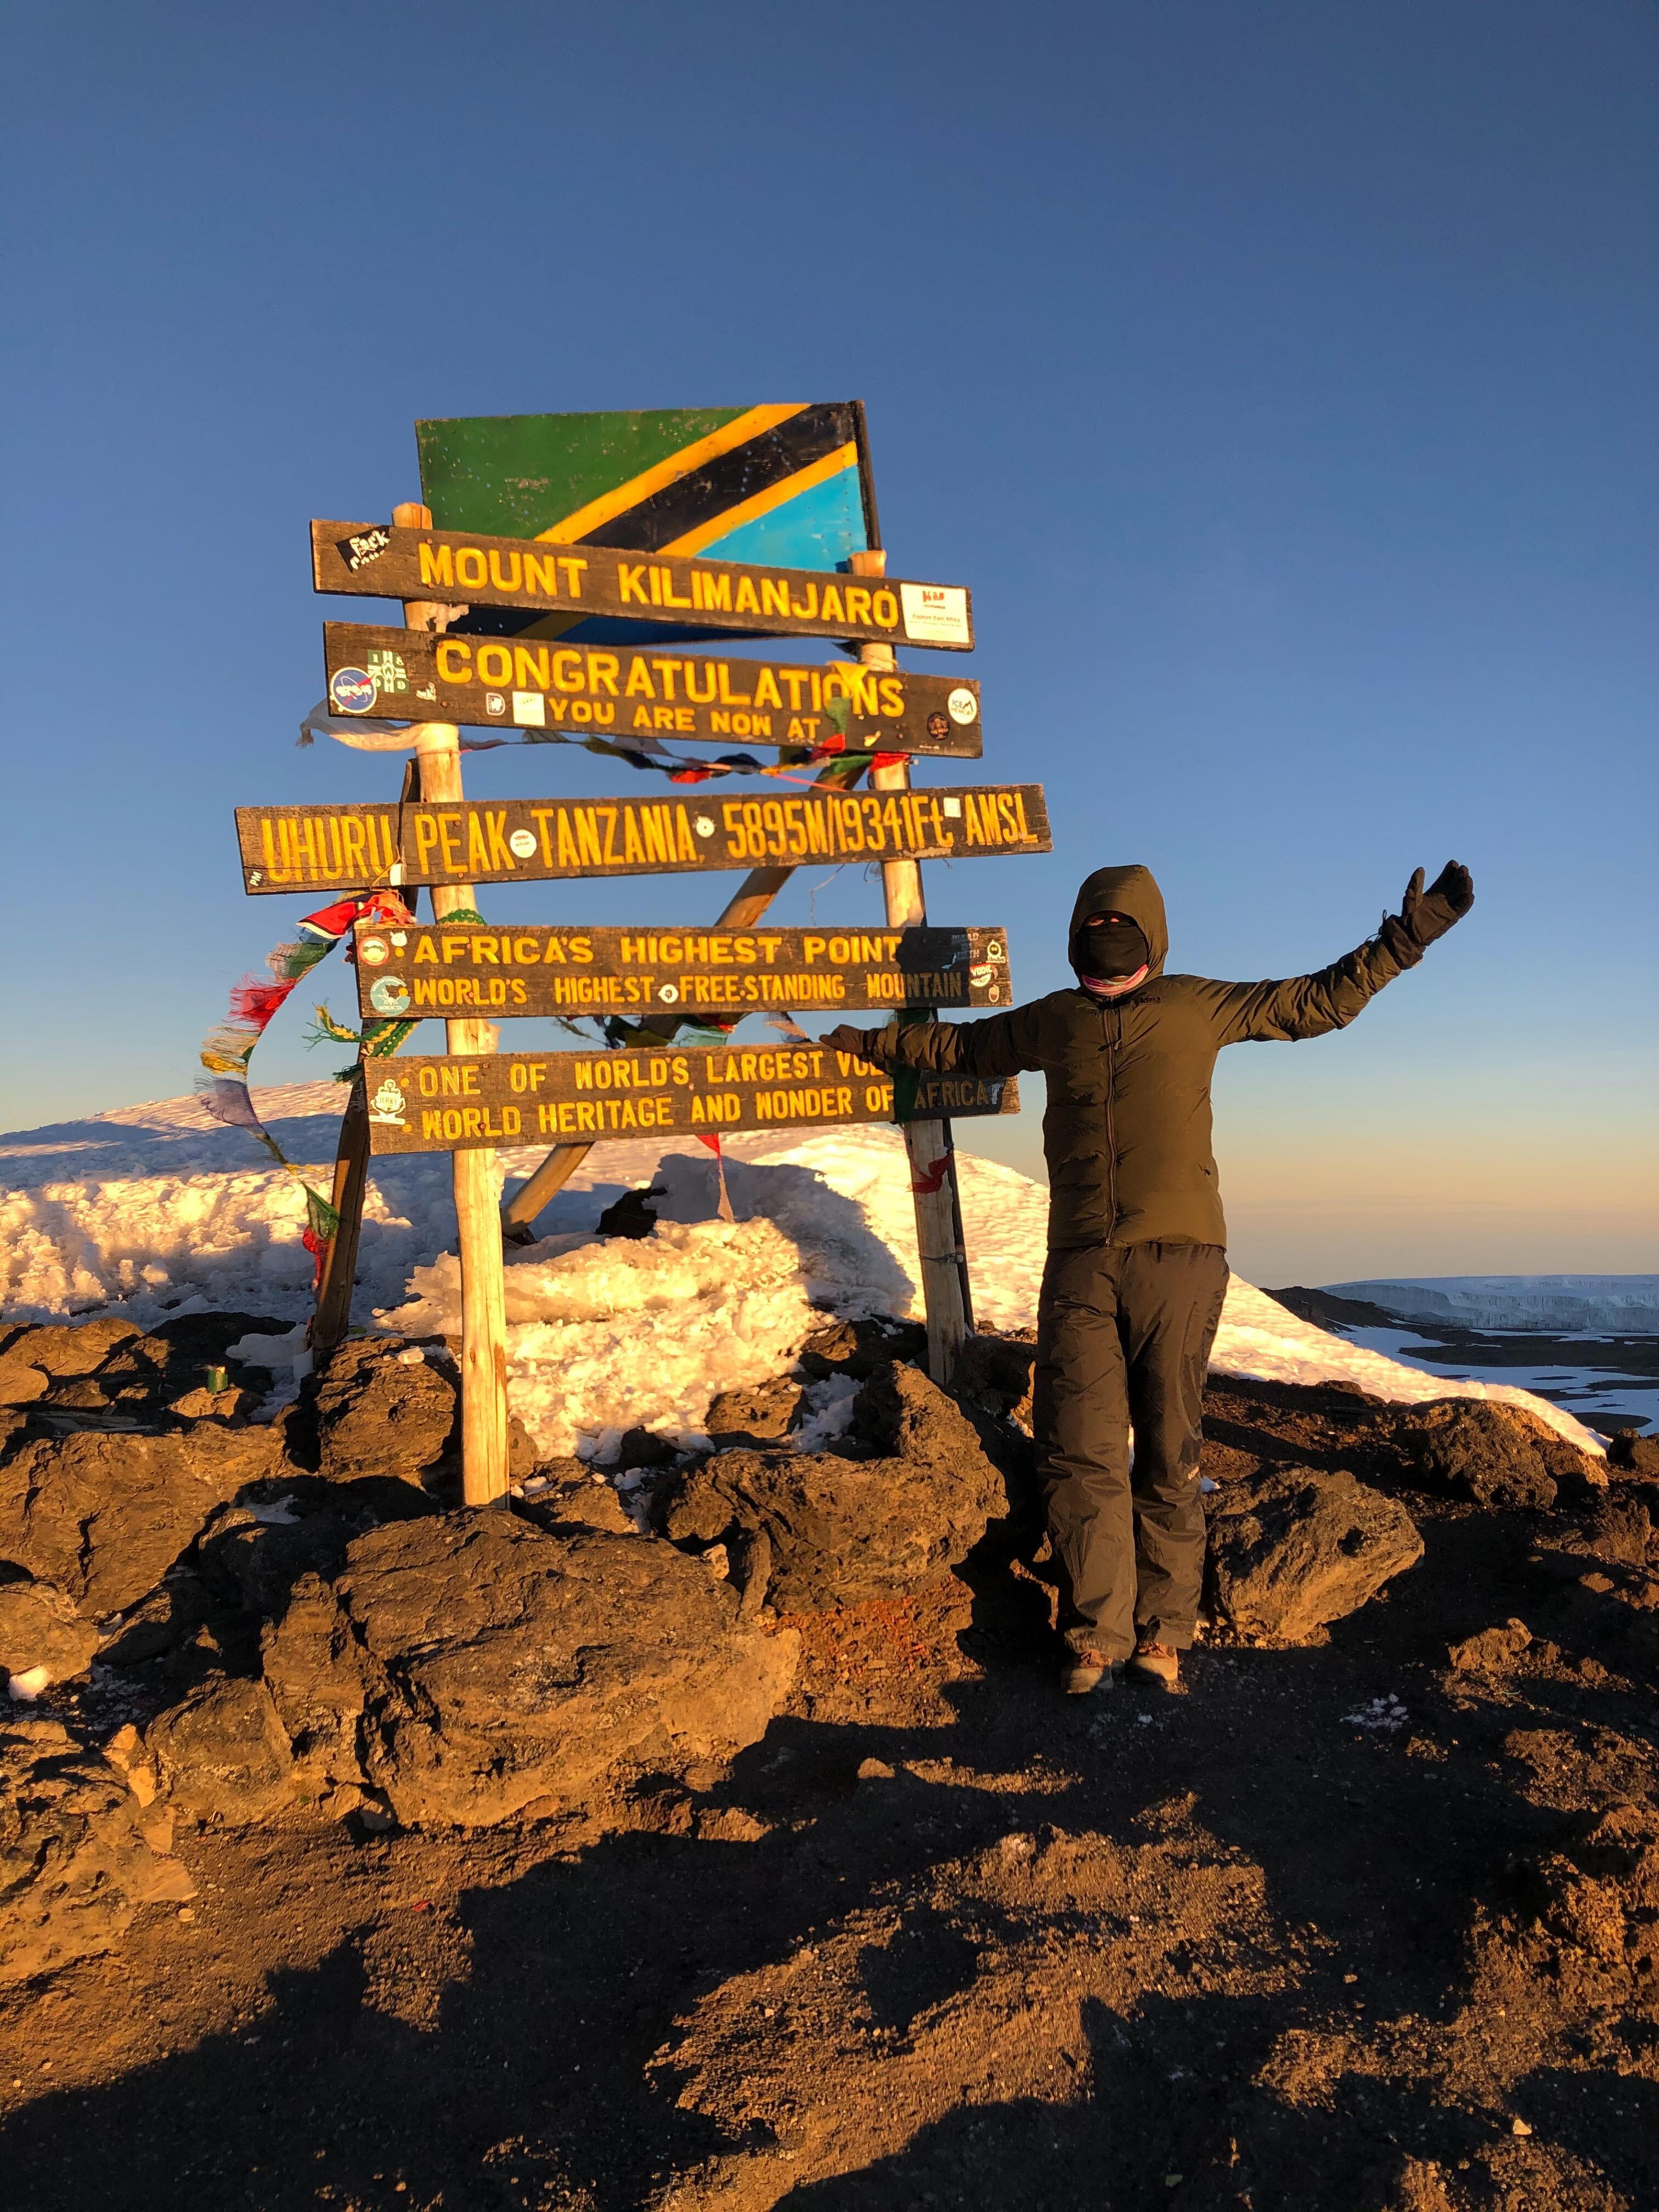 Baltazar Benavides at the top of Mount Kilimanjaro!